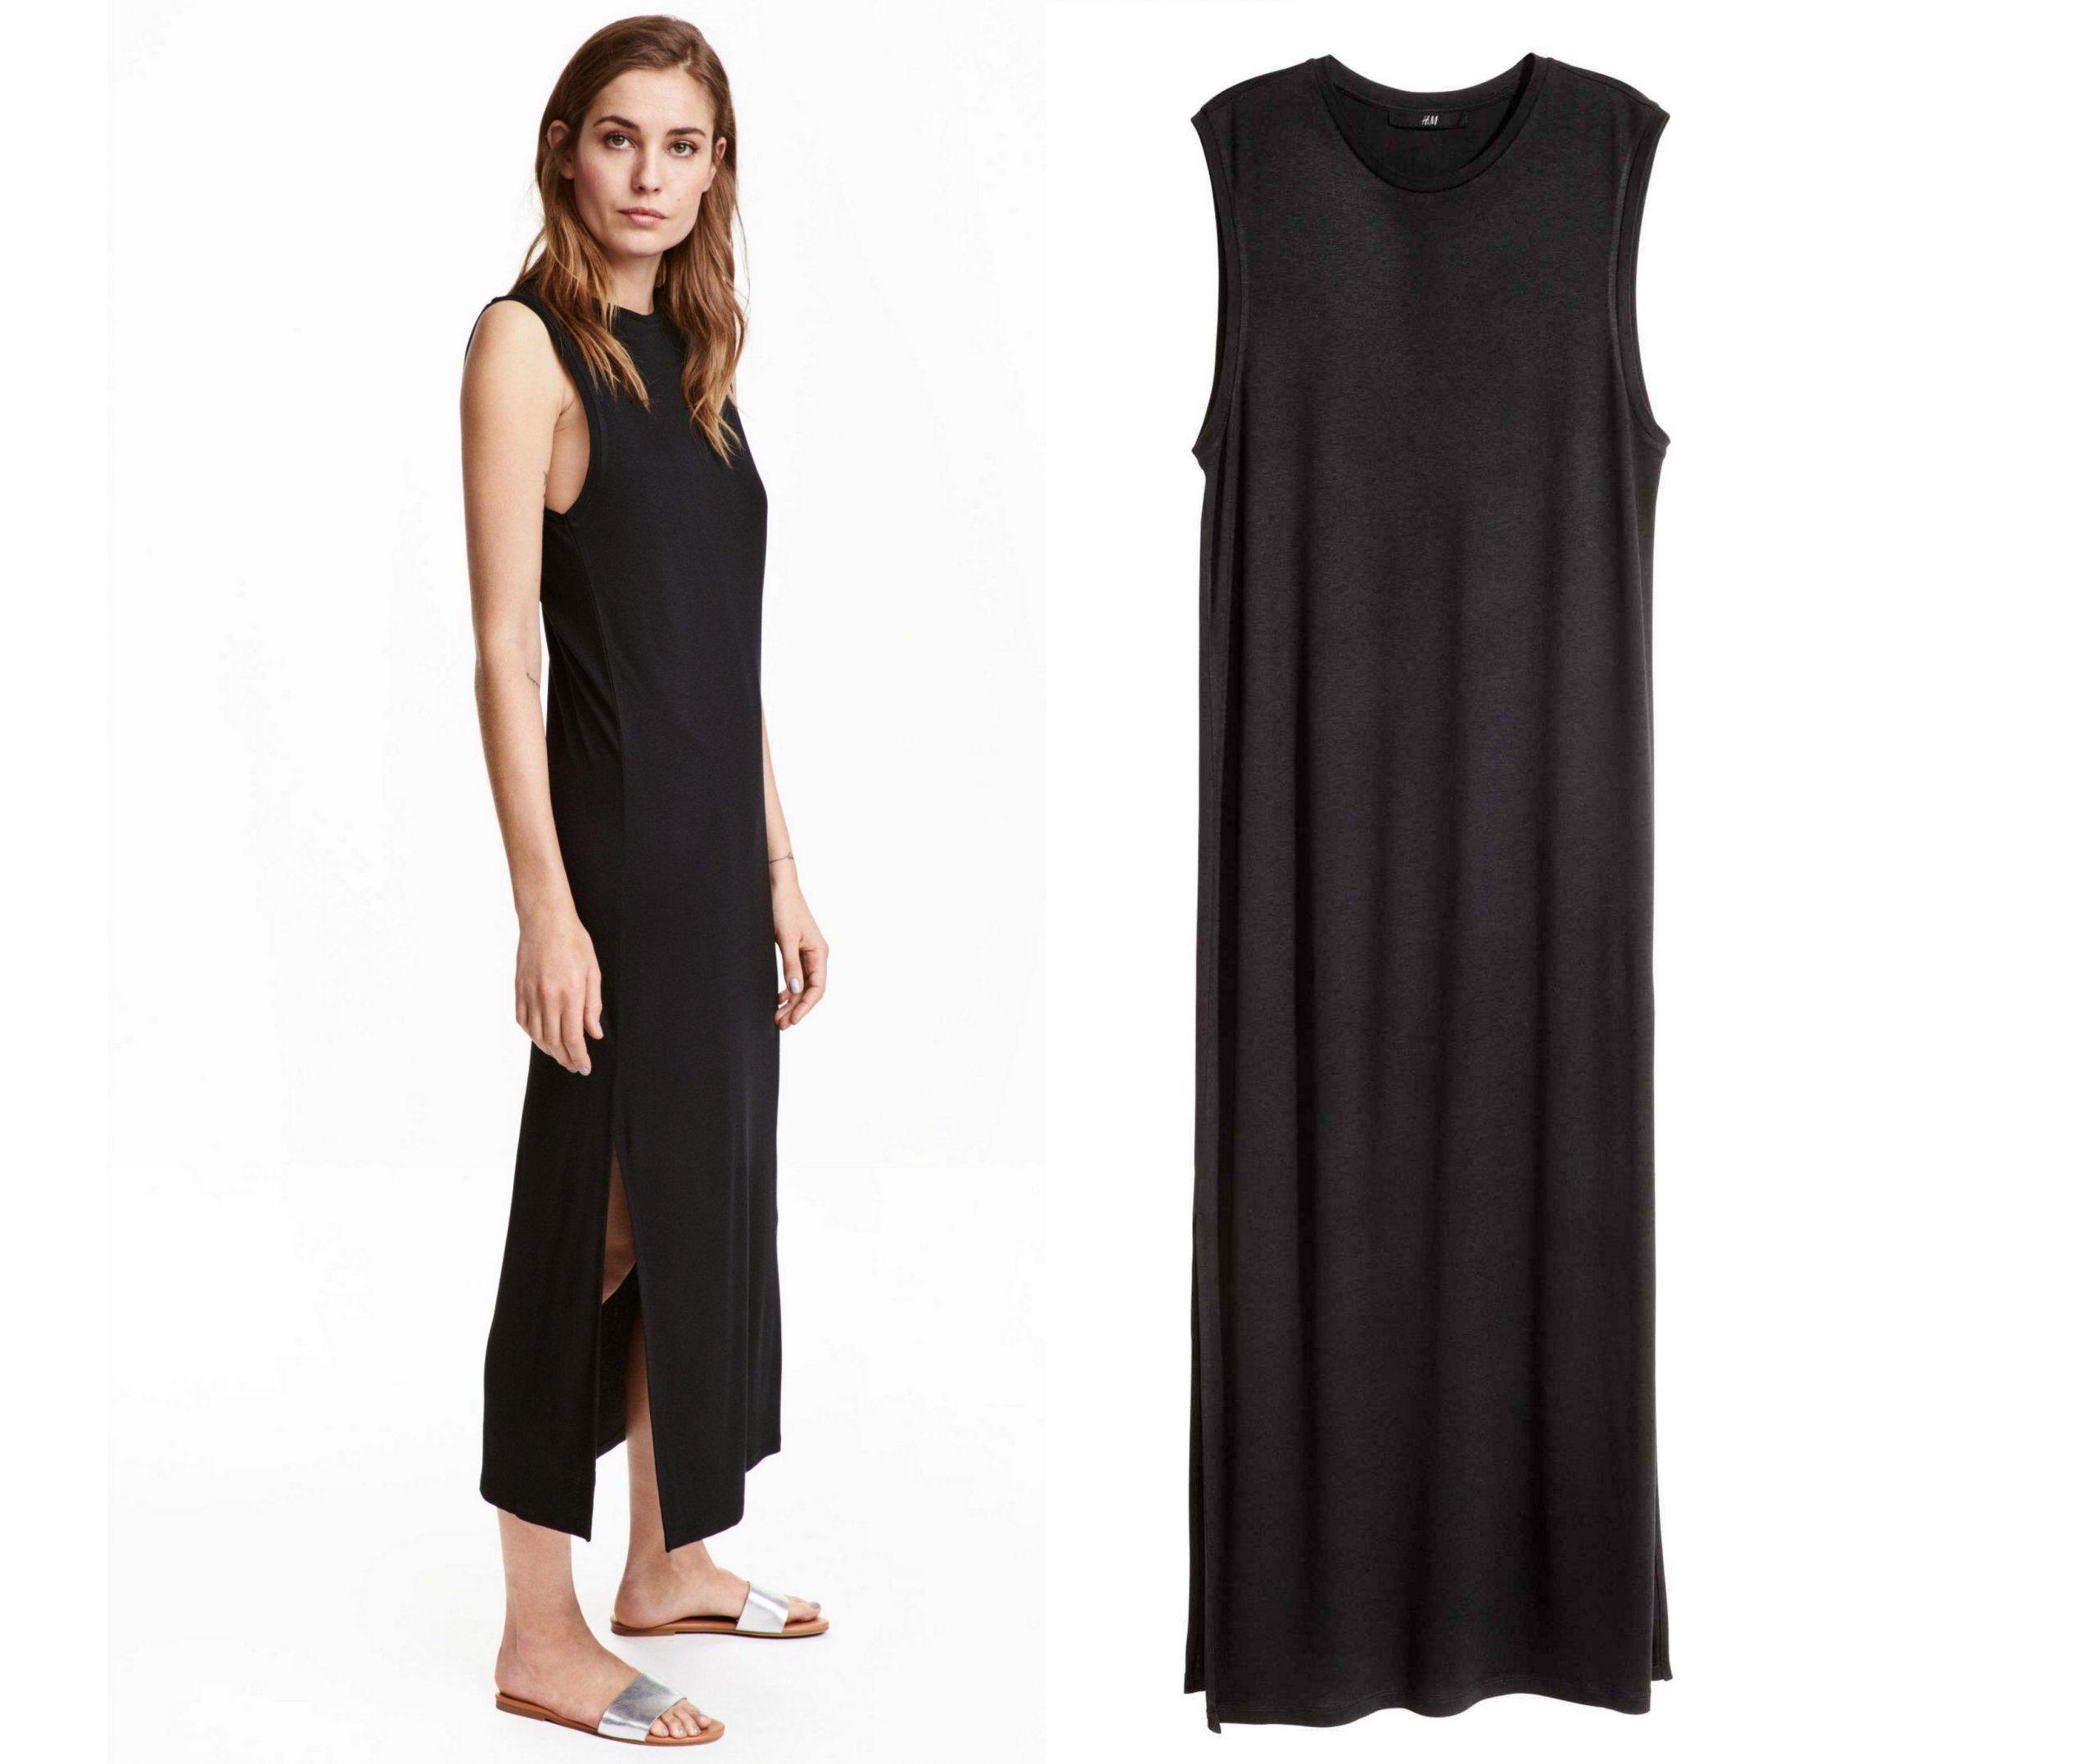 d492479e87 H M czarna suknia NOWA maxi MAFFASHION XS 34 - 7235785516 ...